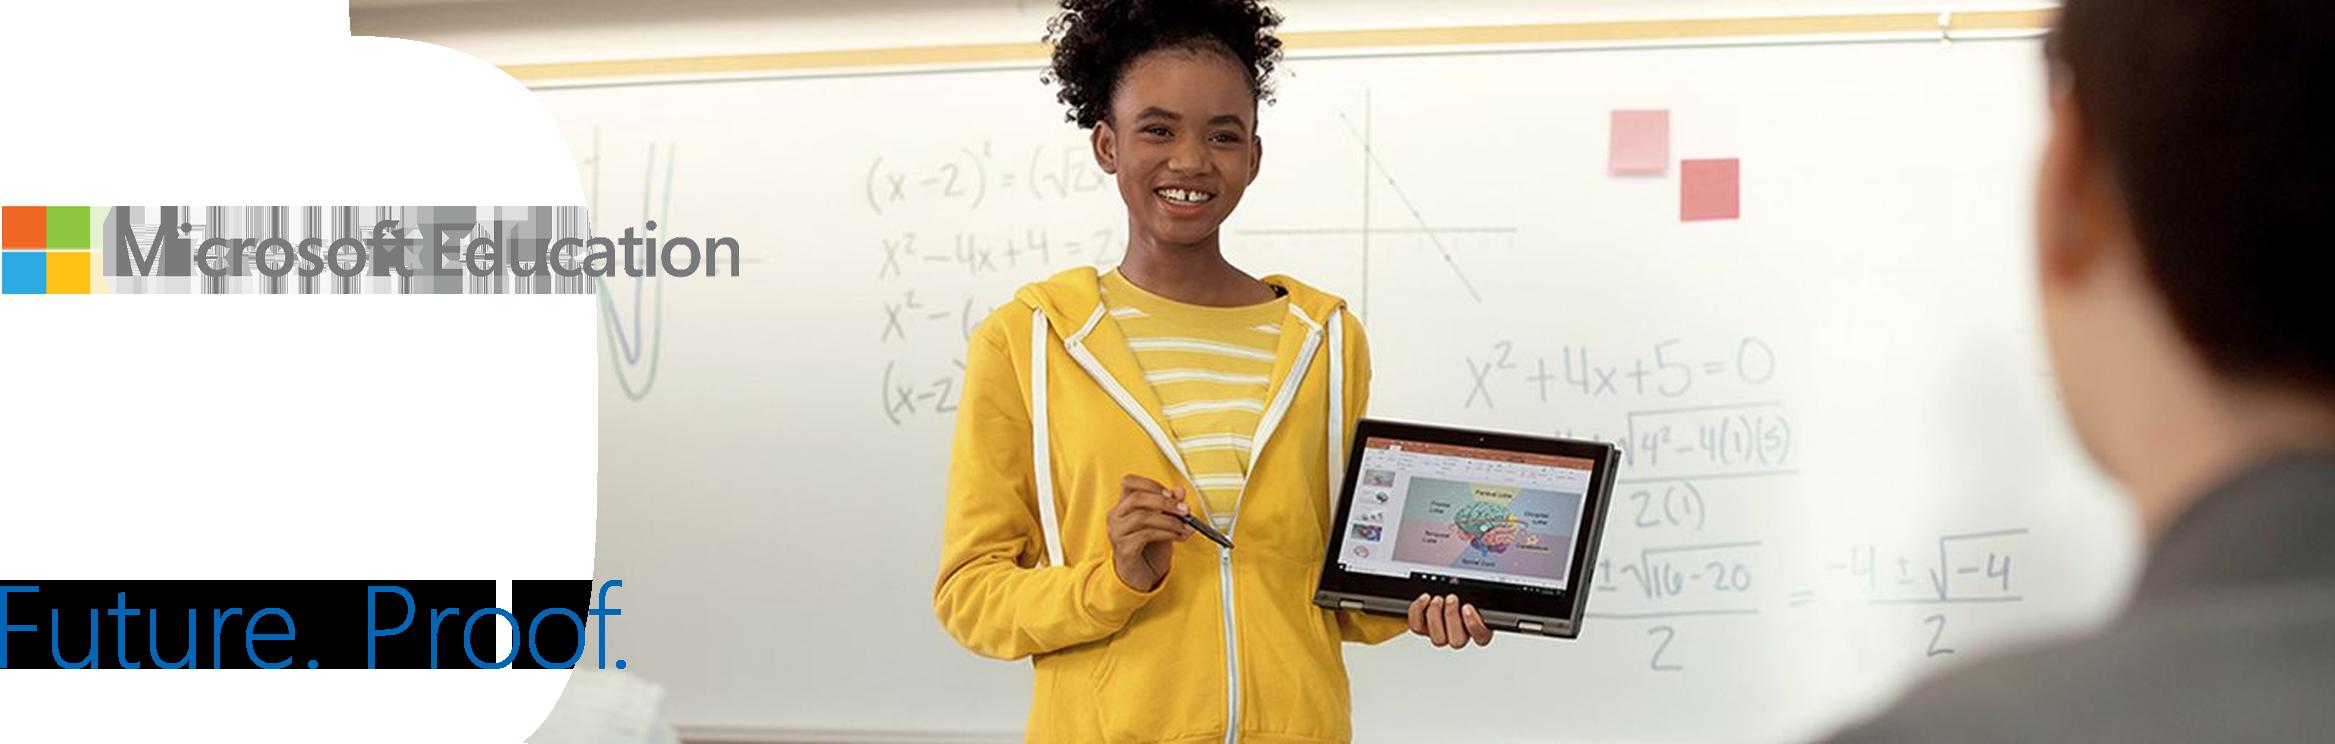 microsoft-education